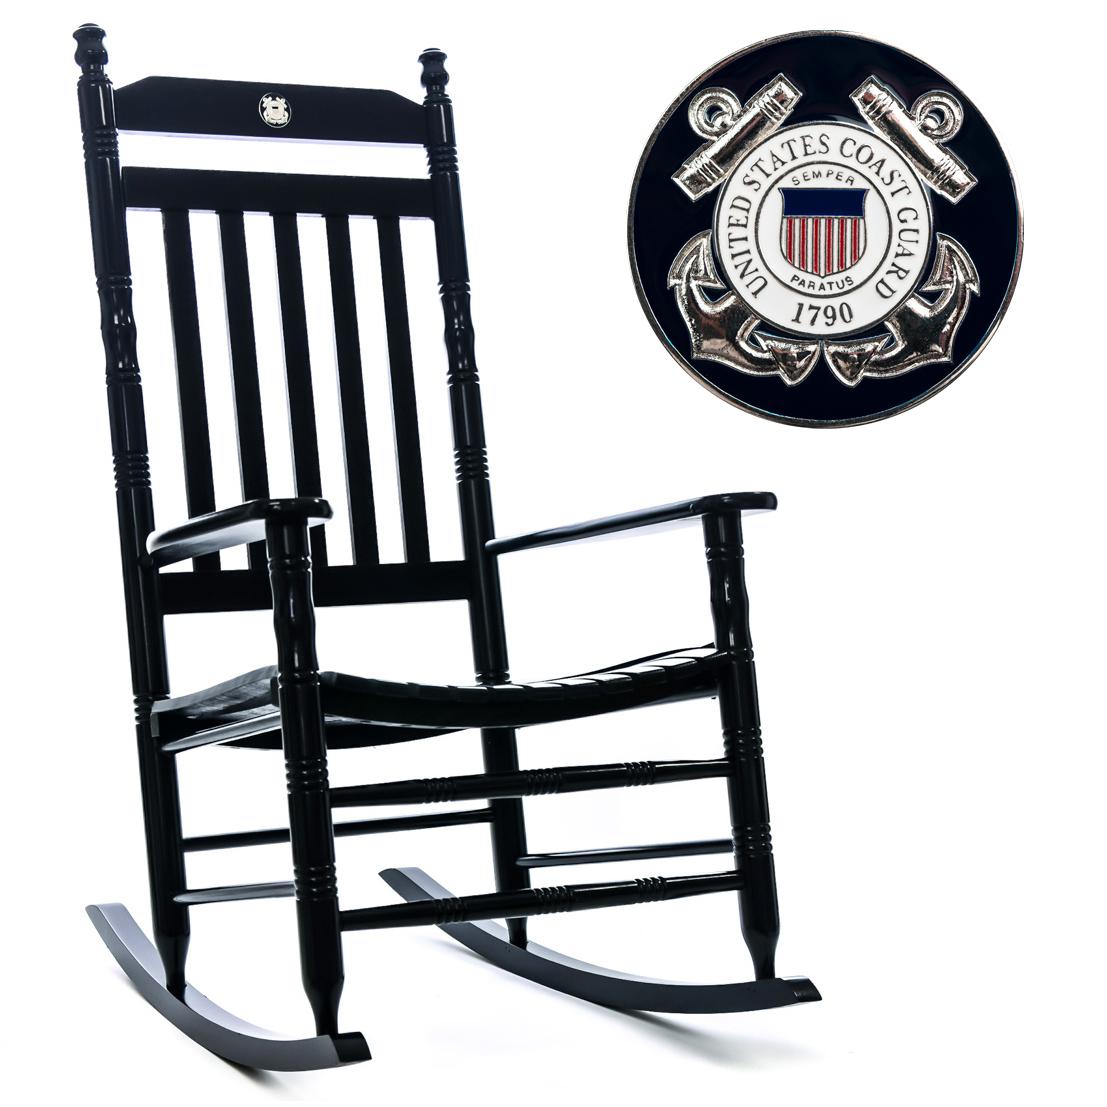 U.S. Coast Guard Fully Assembled Rocking Chair